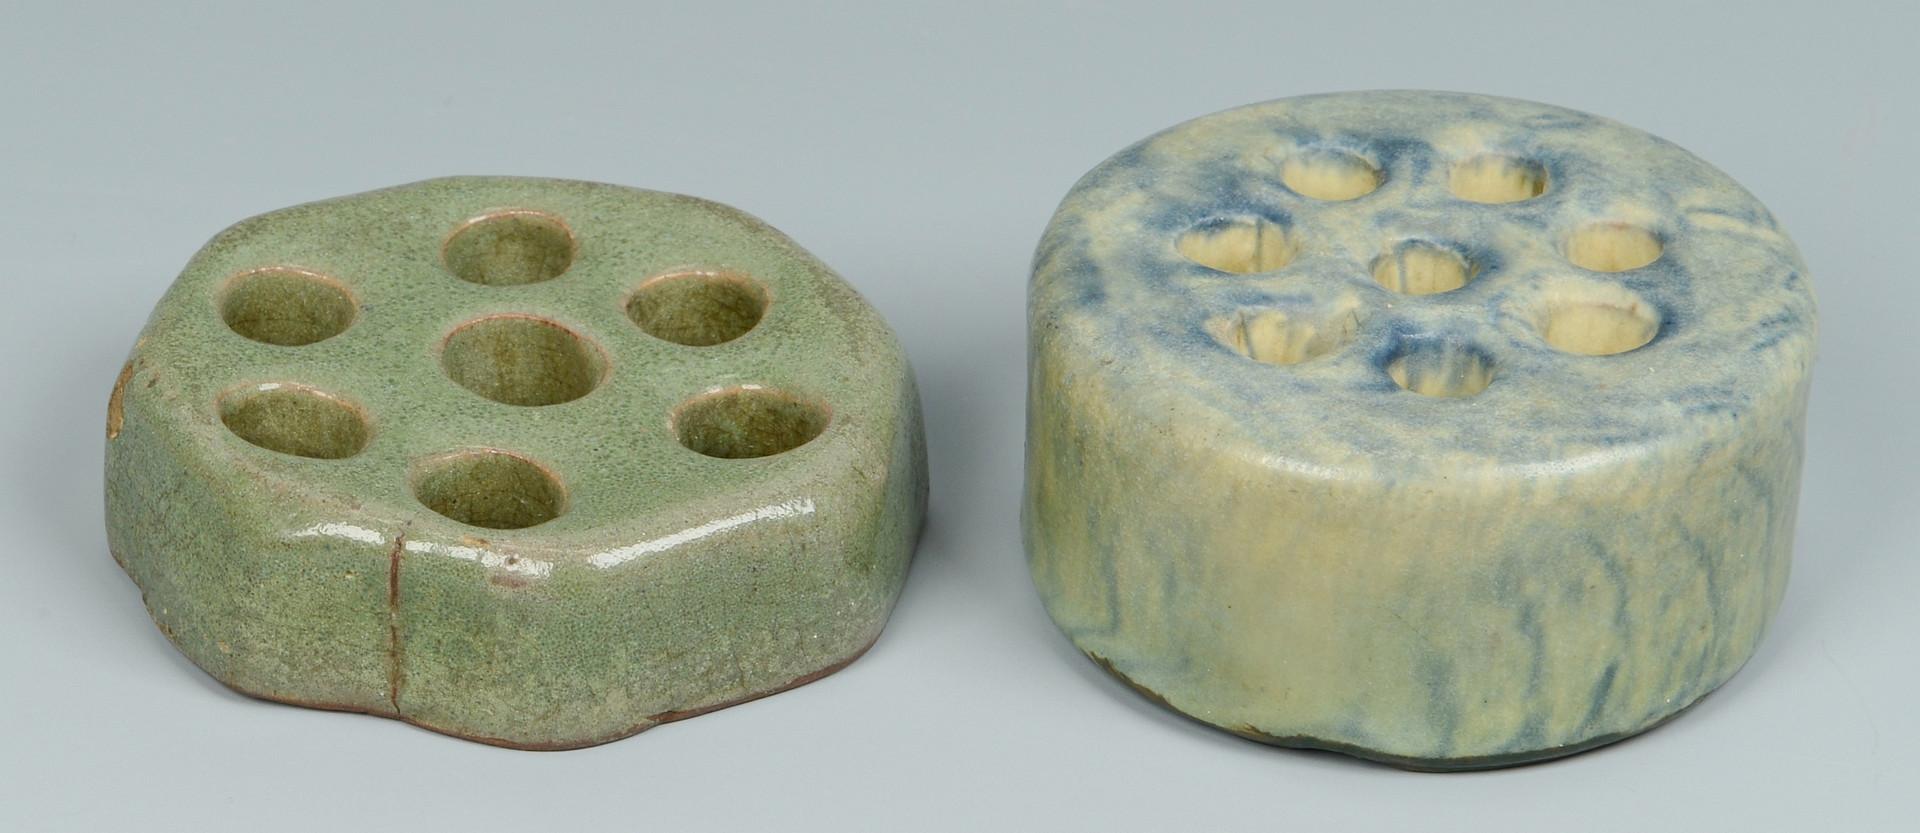 Lot 576: 6 Art Pottery Flower Frogs inc Revere, Rookwood